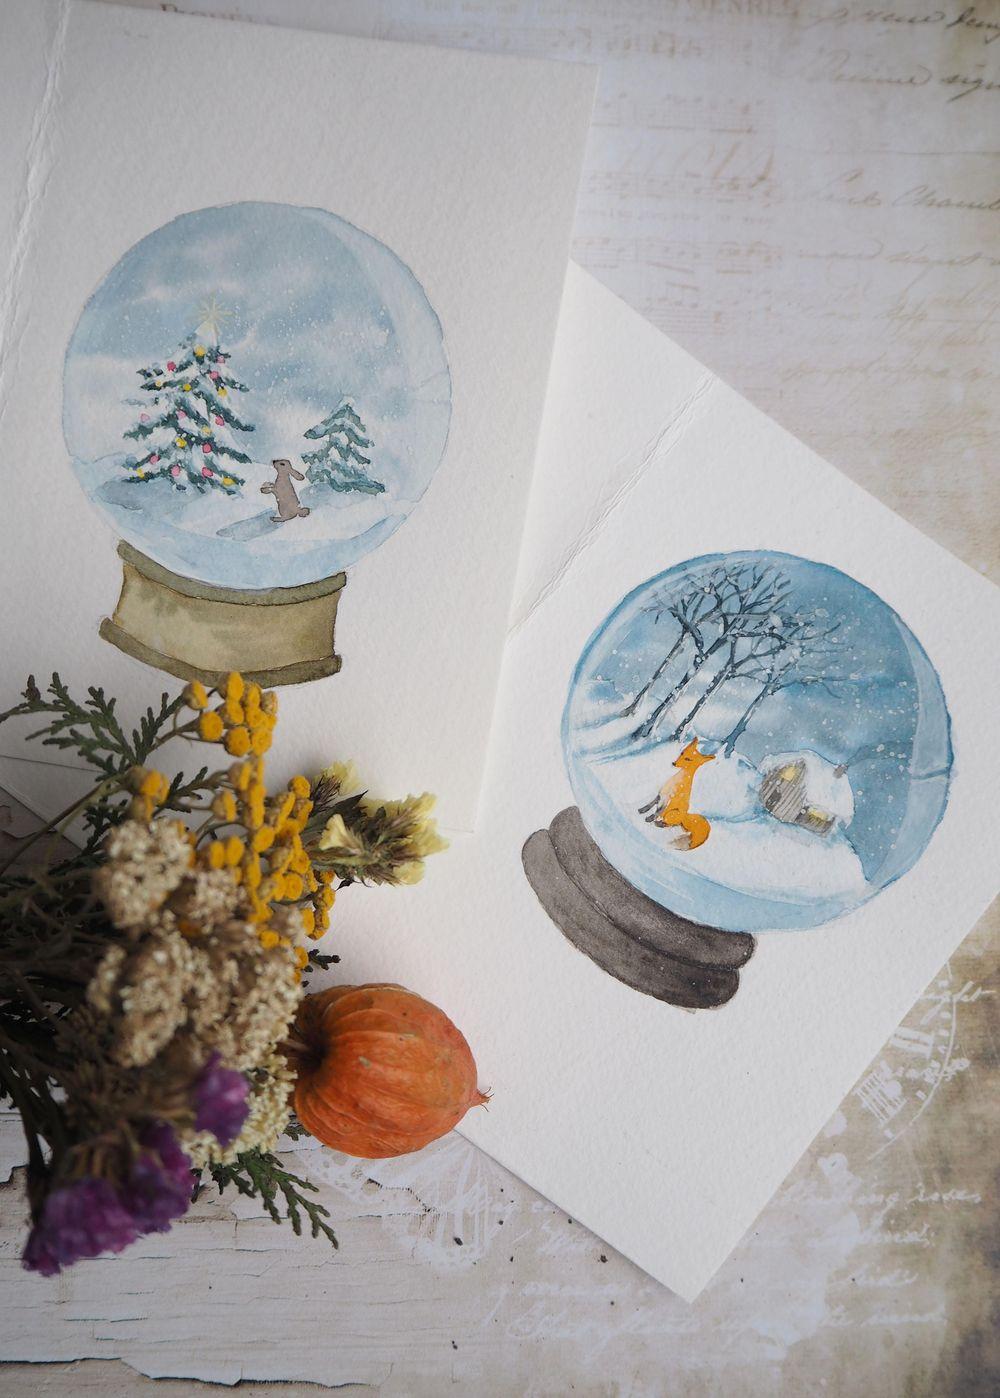 Winter wonderland - image 1 - student project